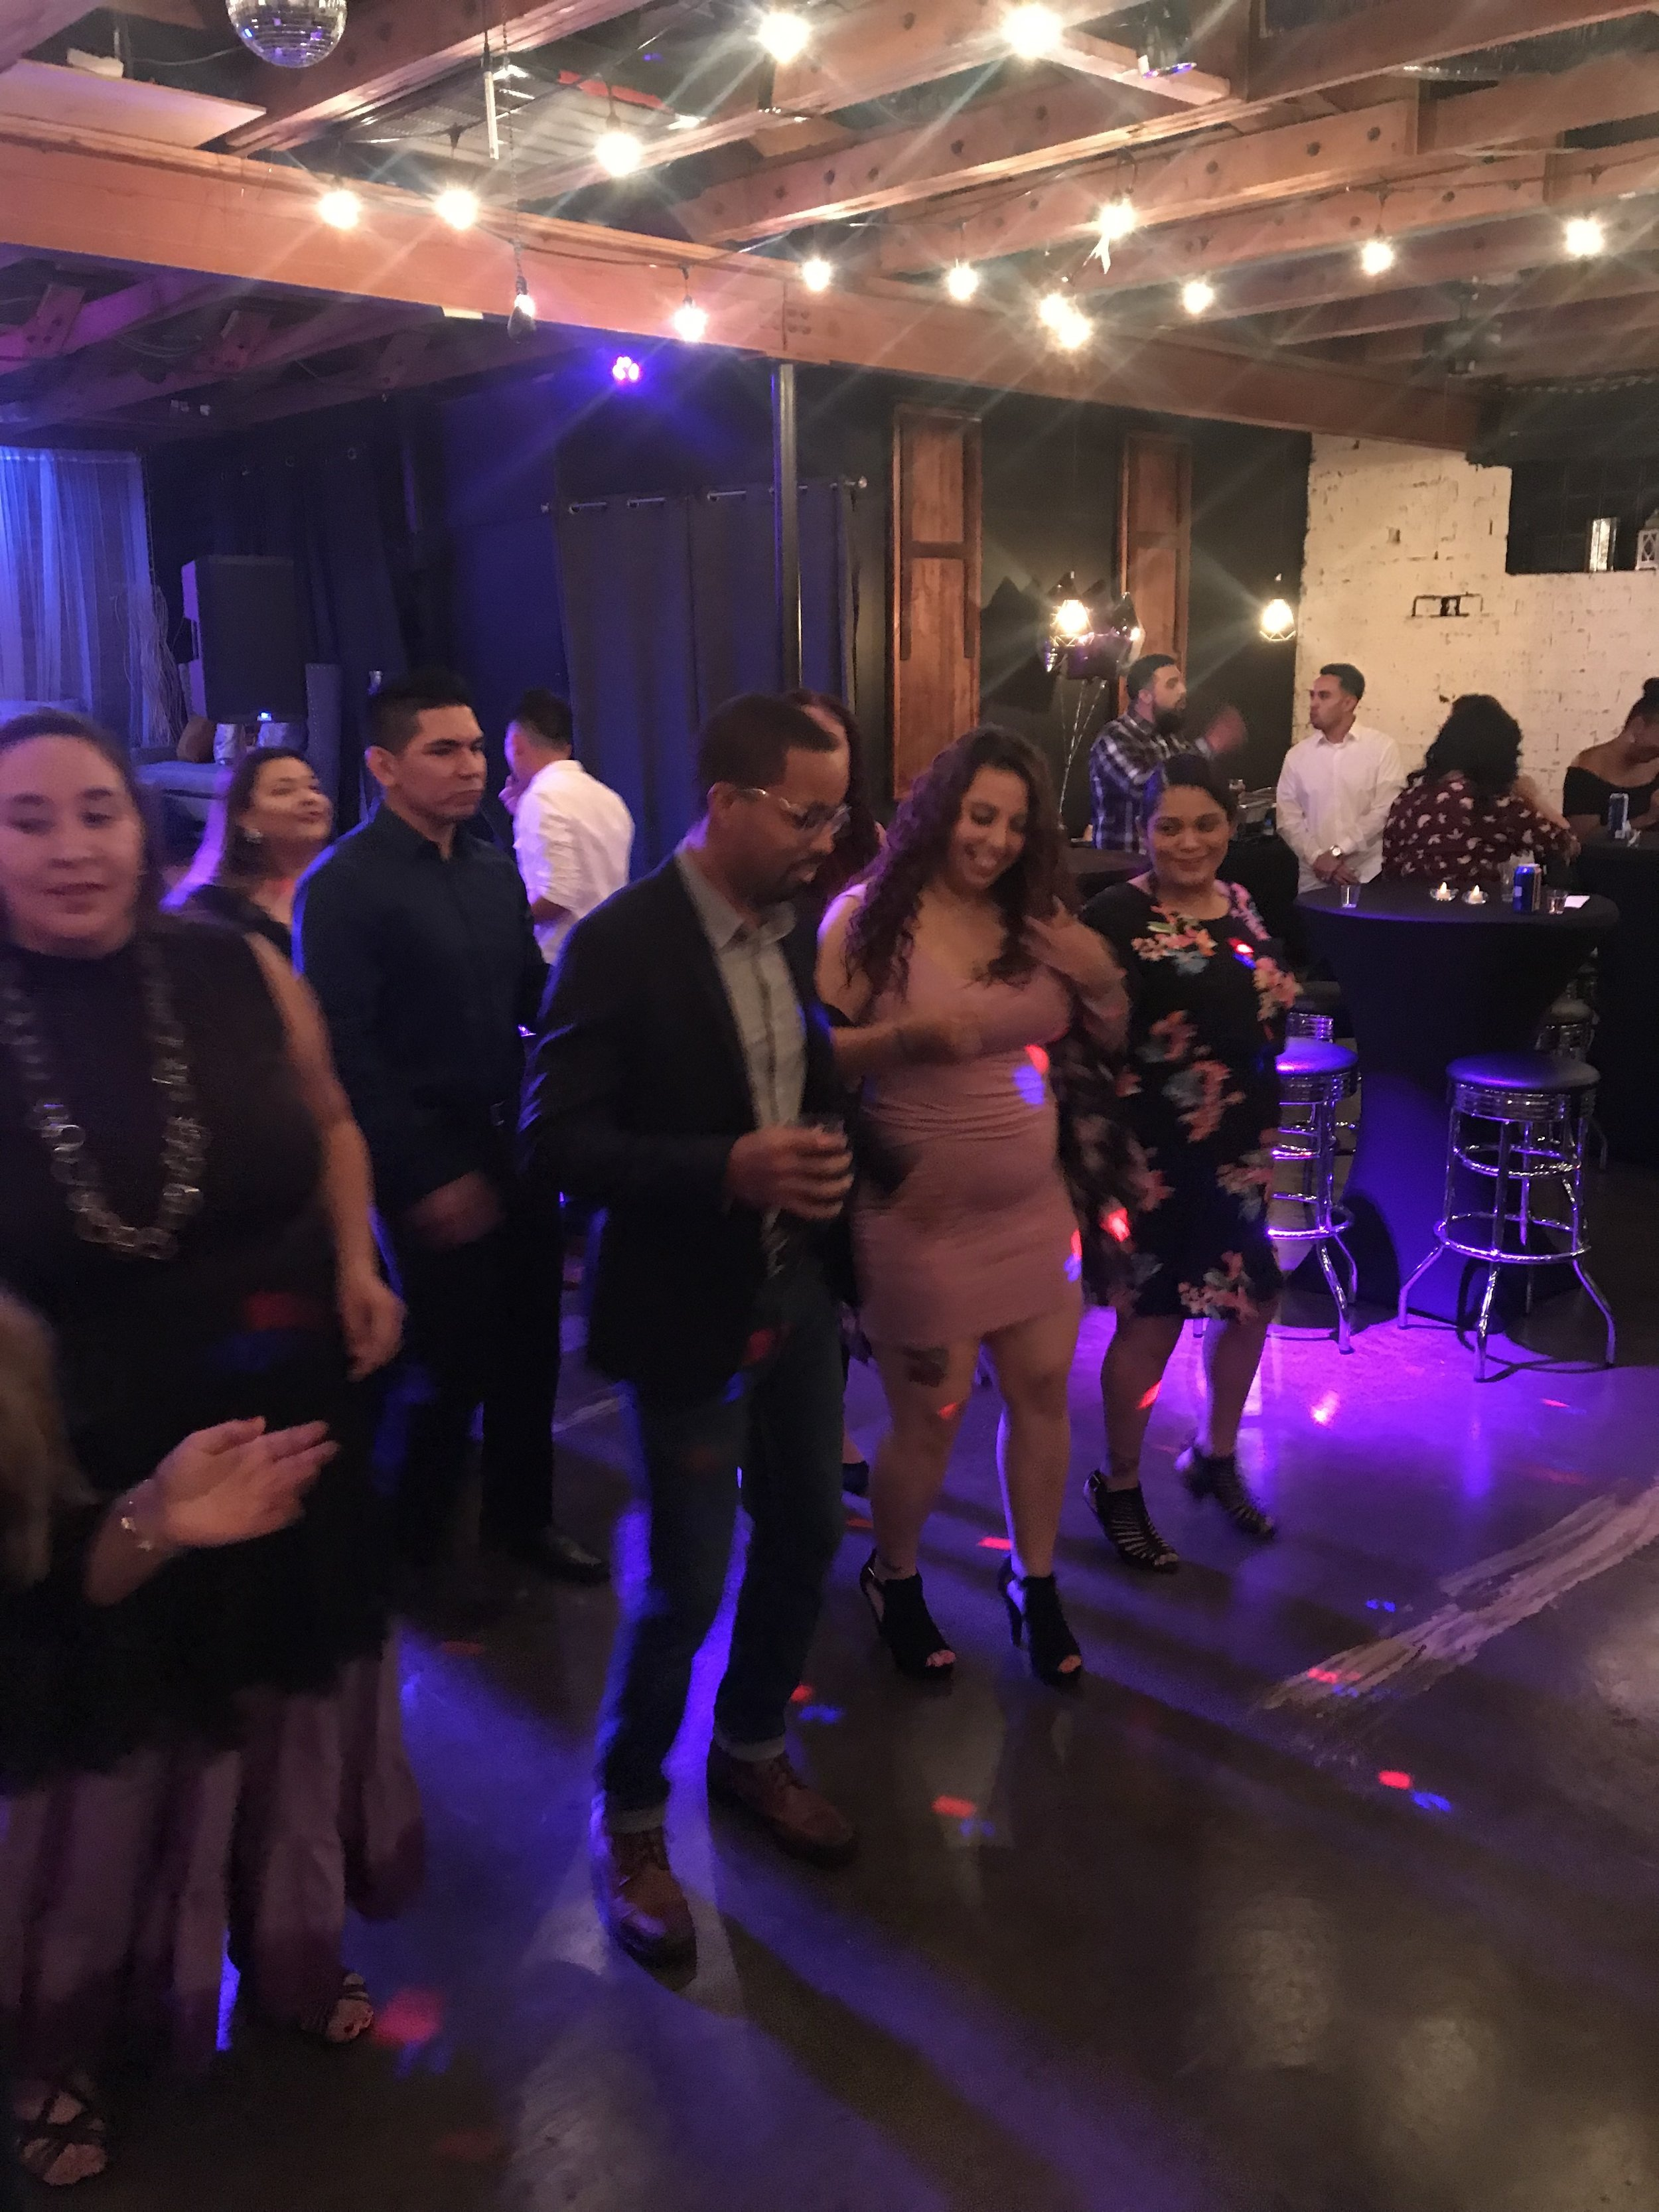 chavez dance.JPG